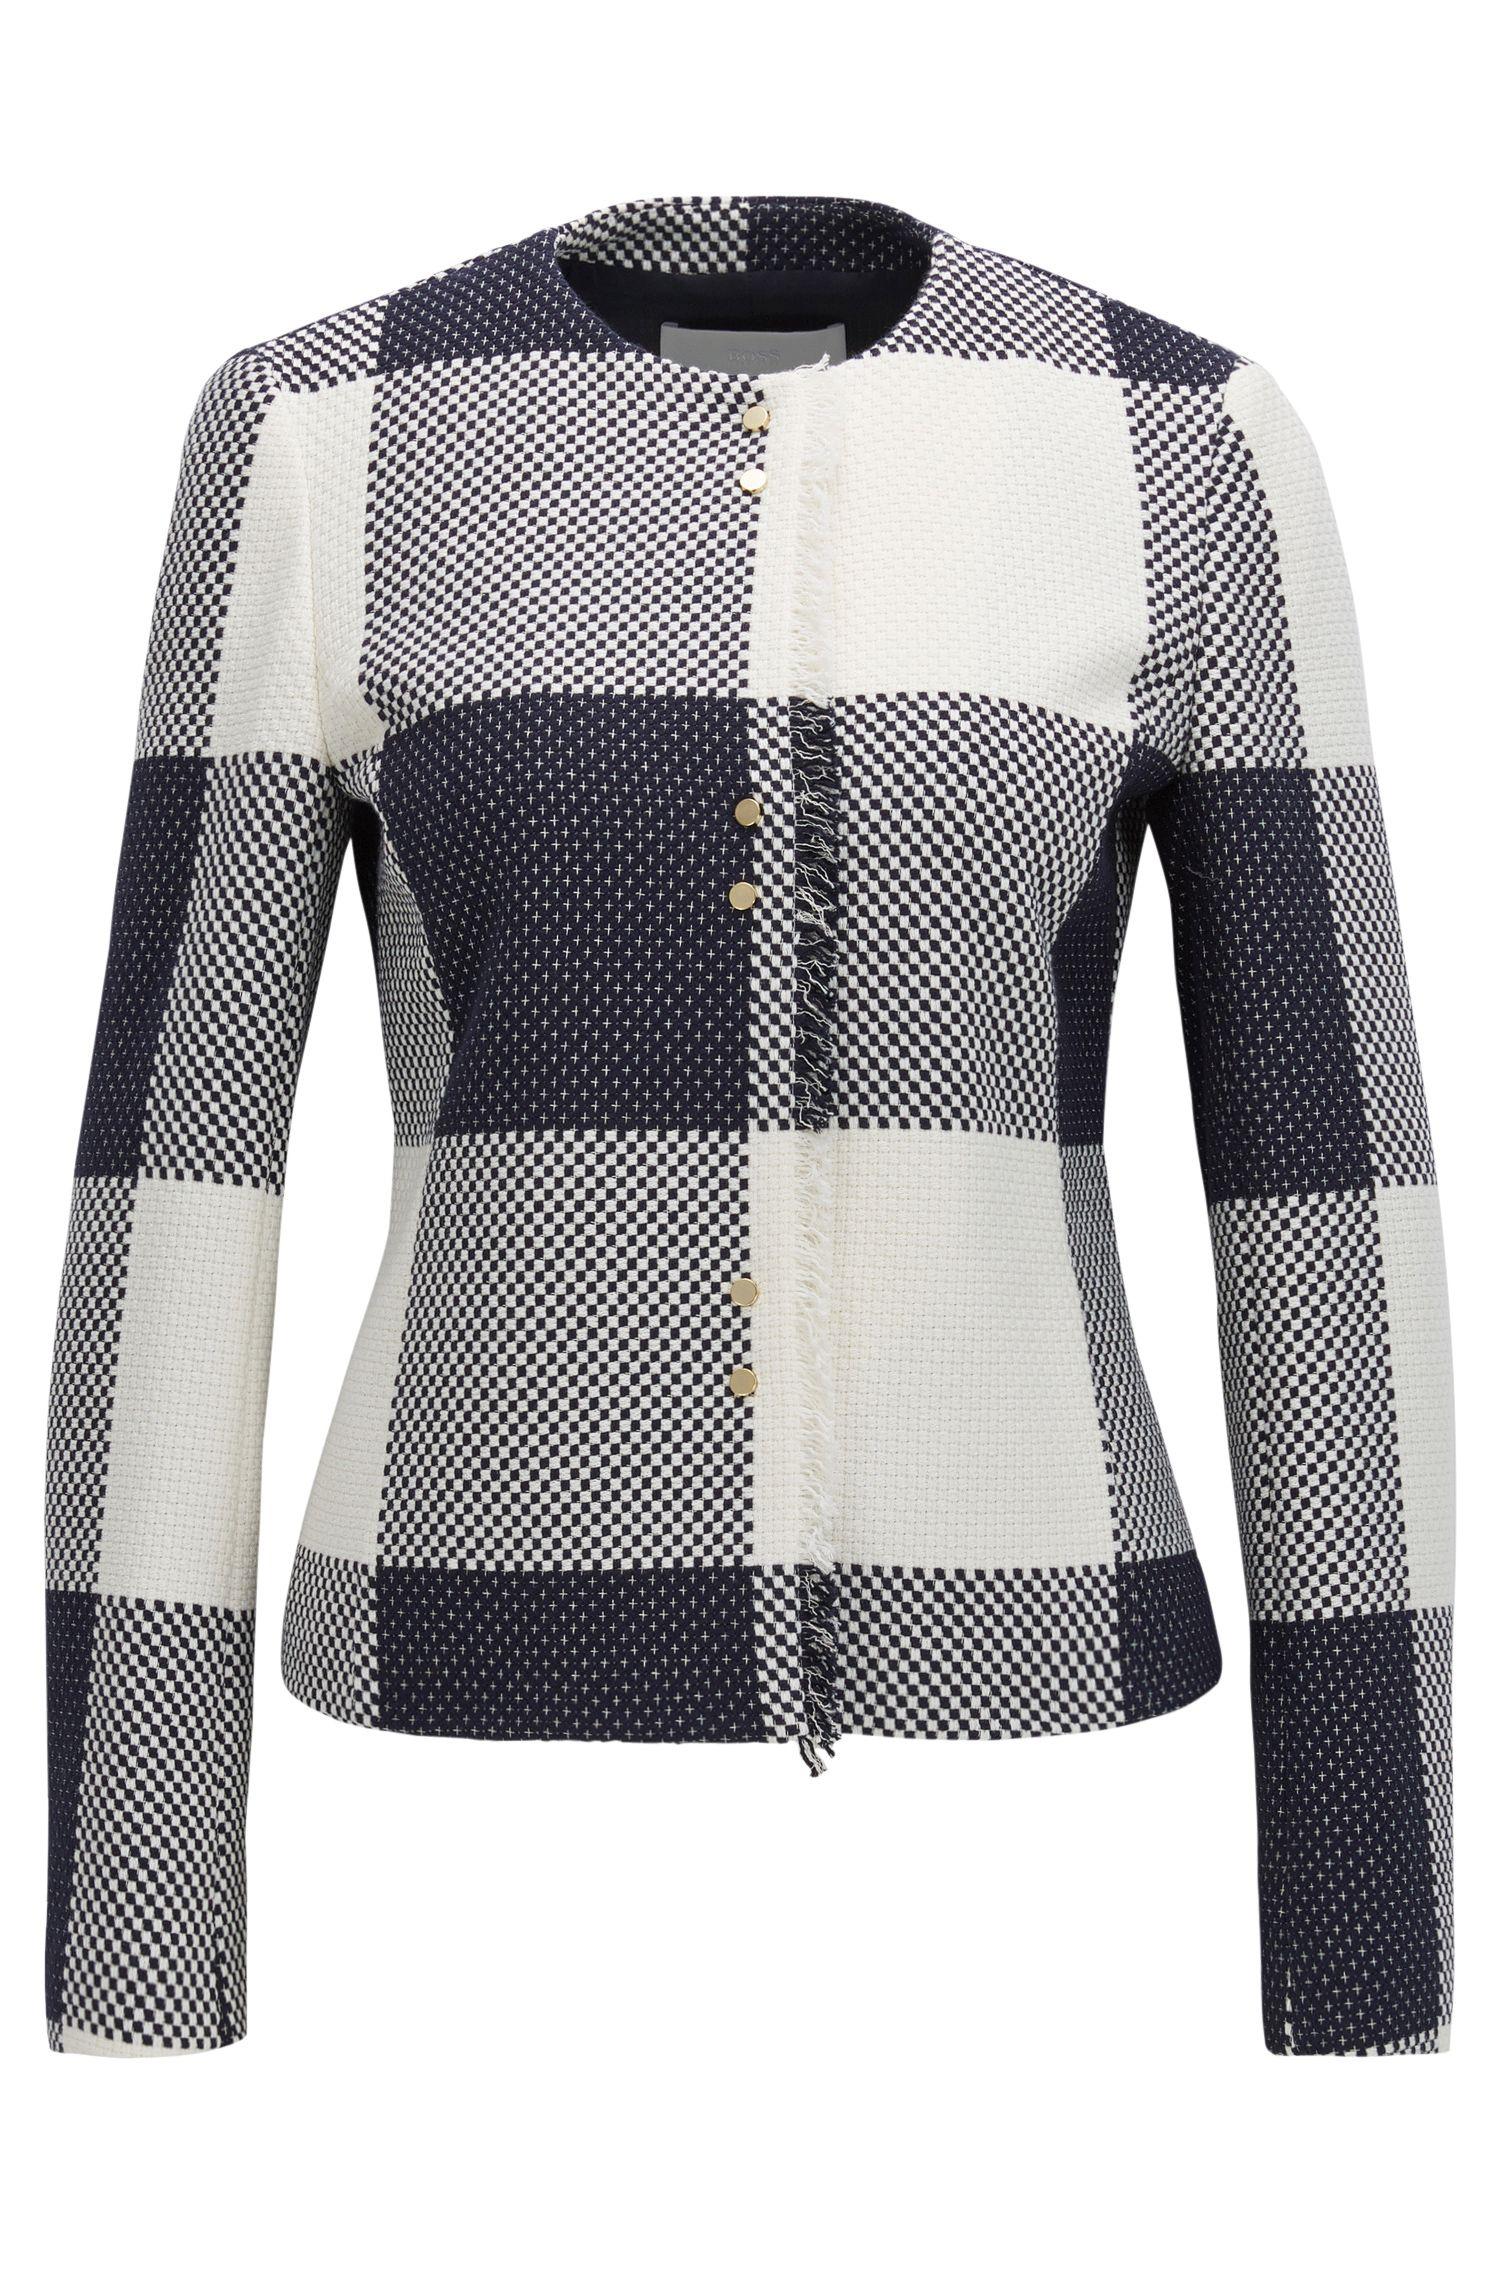 Gingham Cotton Jacket | Karolie